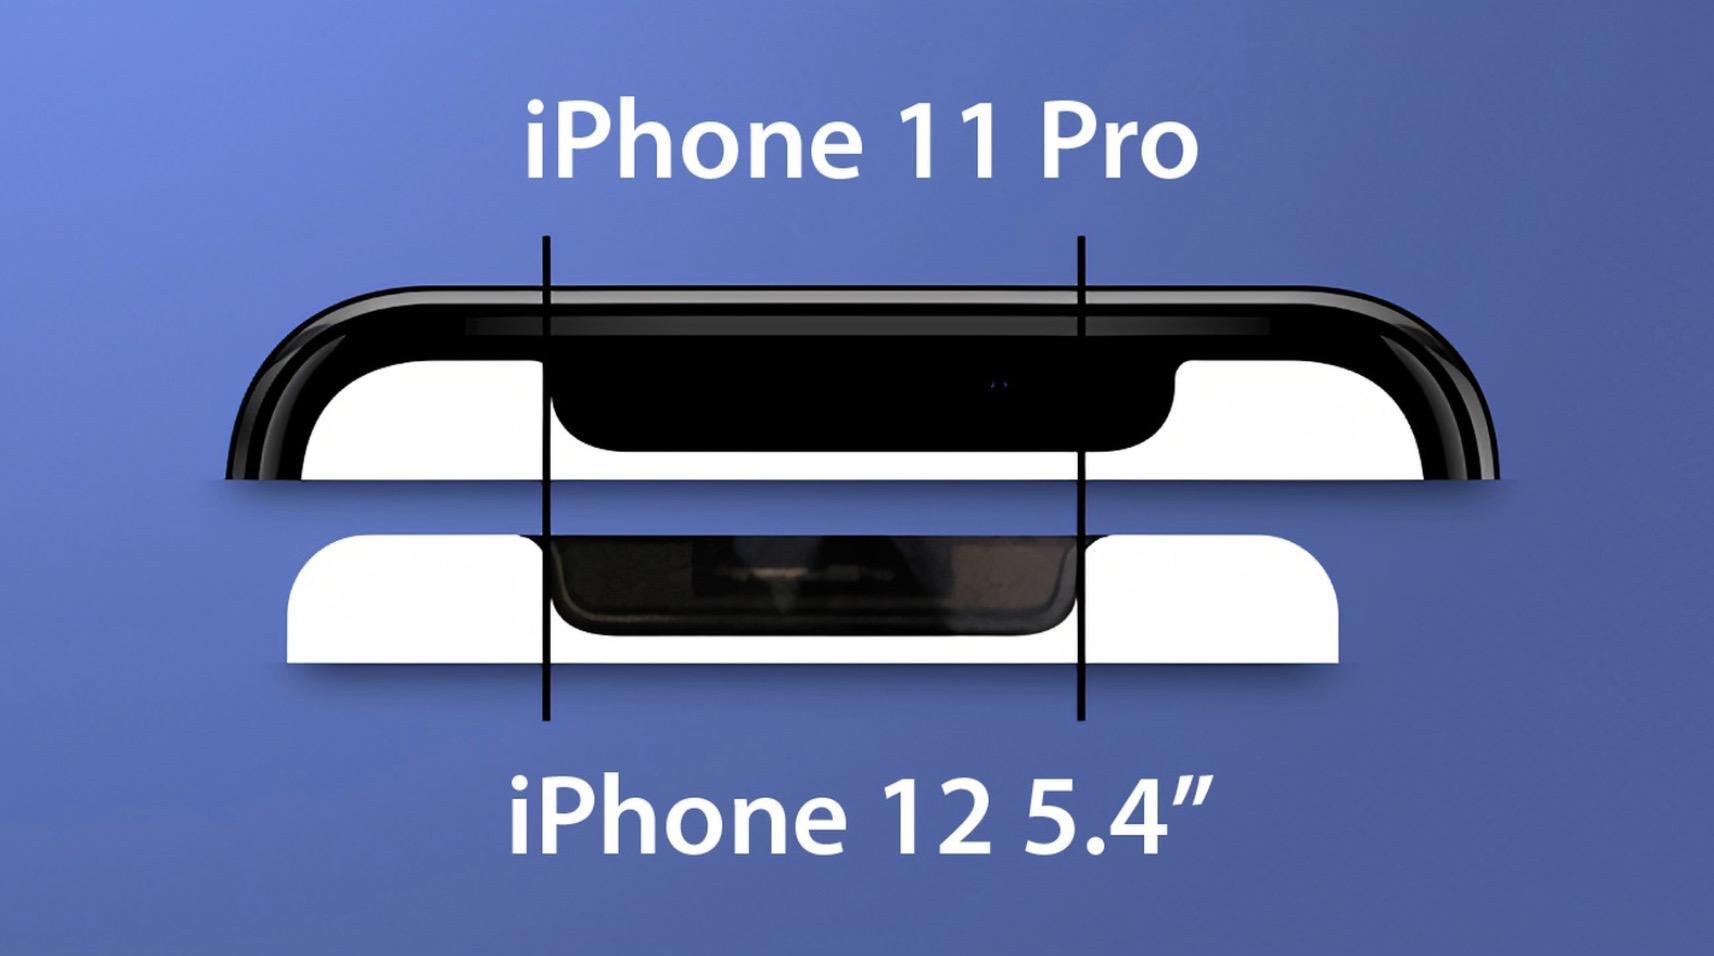 iphone 11 pro vs iphone 12